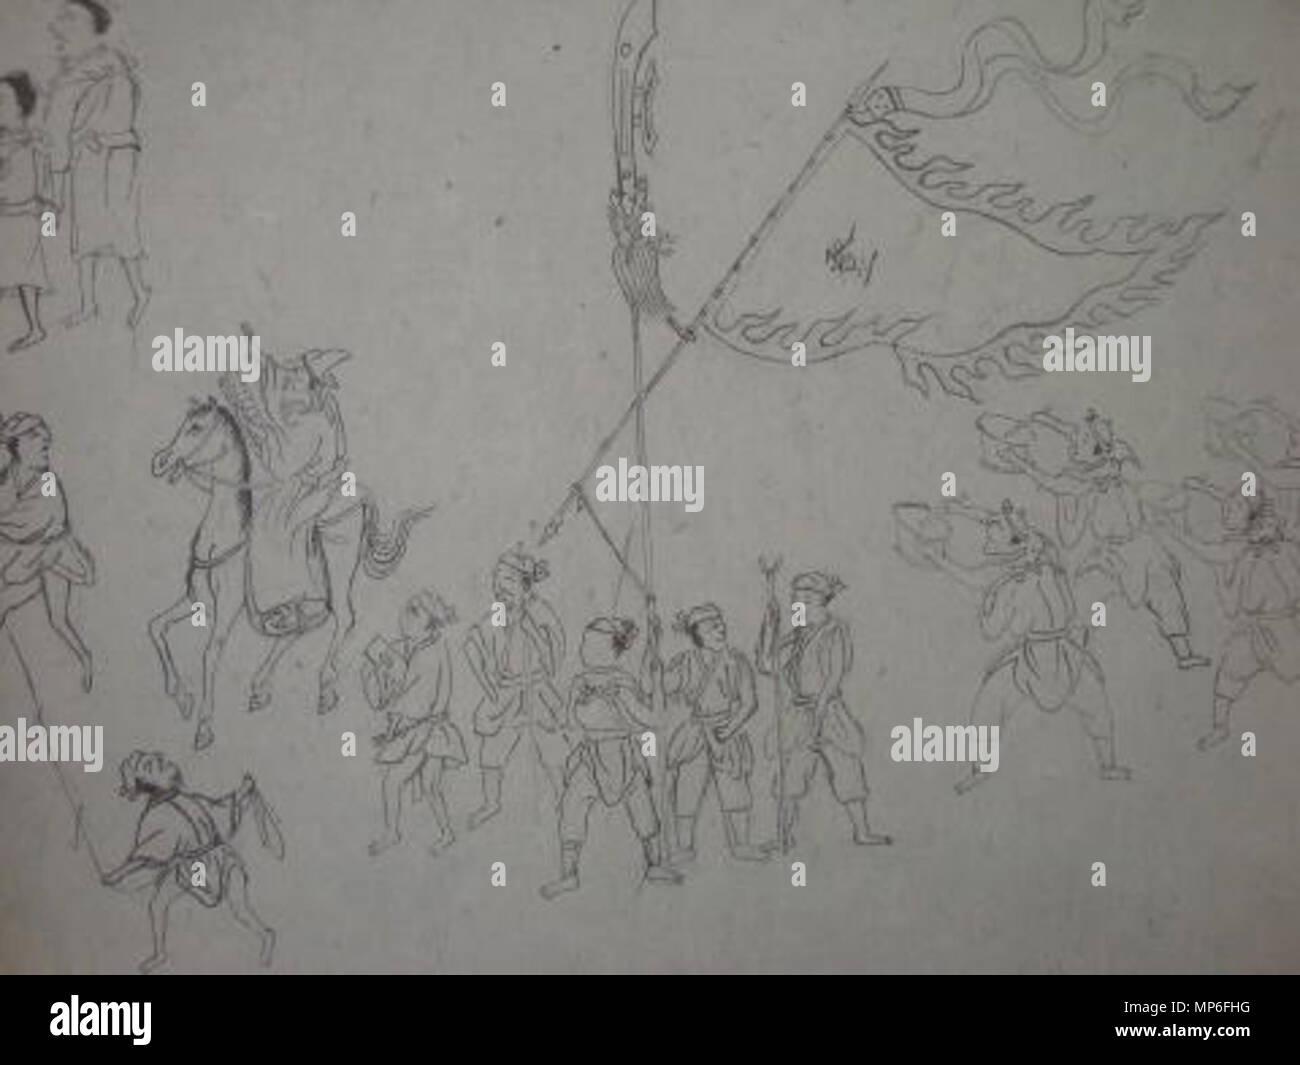 . English: Sketch by Kuramoto, Ishigaki City Yaeyama Museum, Ishigaki, Okinawa, Japan 日本語: 蔵元絵師の画稿 . C18/19. Kuramoto 1127 Sketch by Kuramoto (Ishigaki) - Stock Image